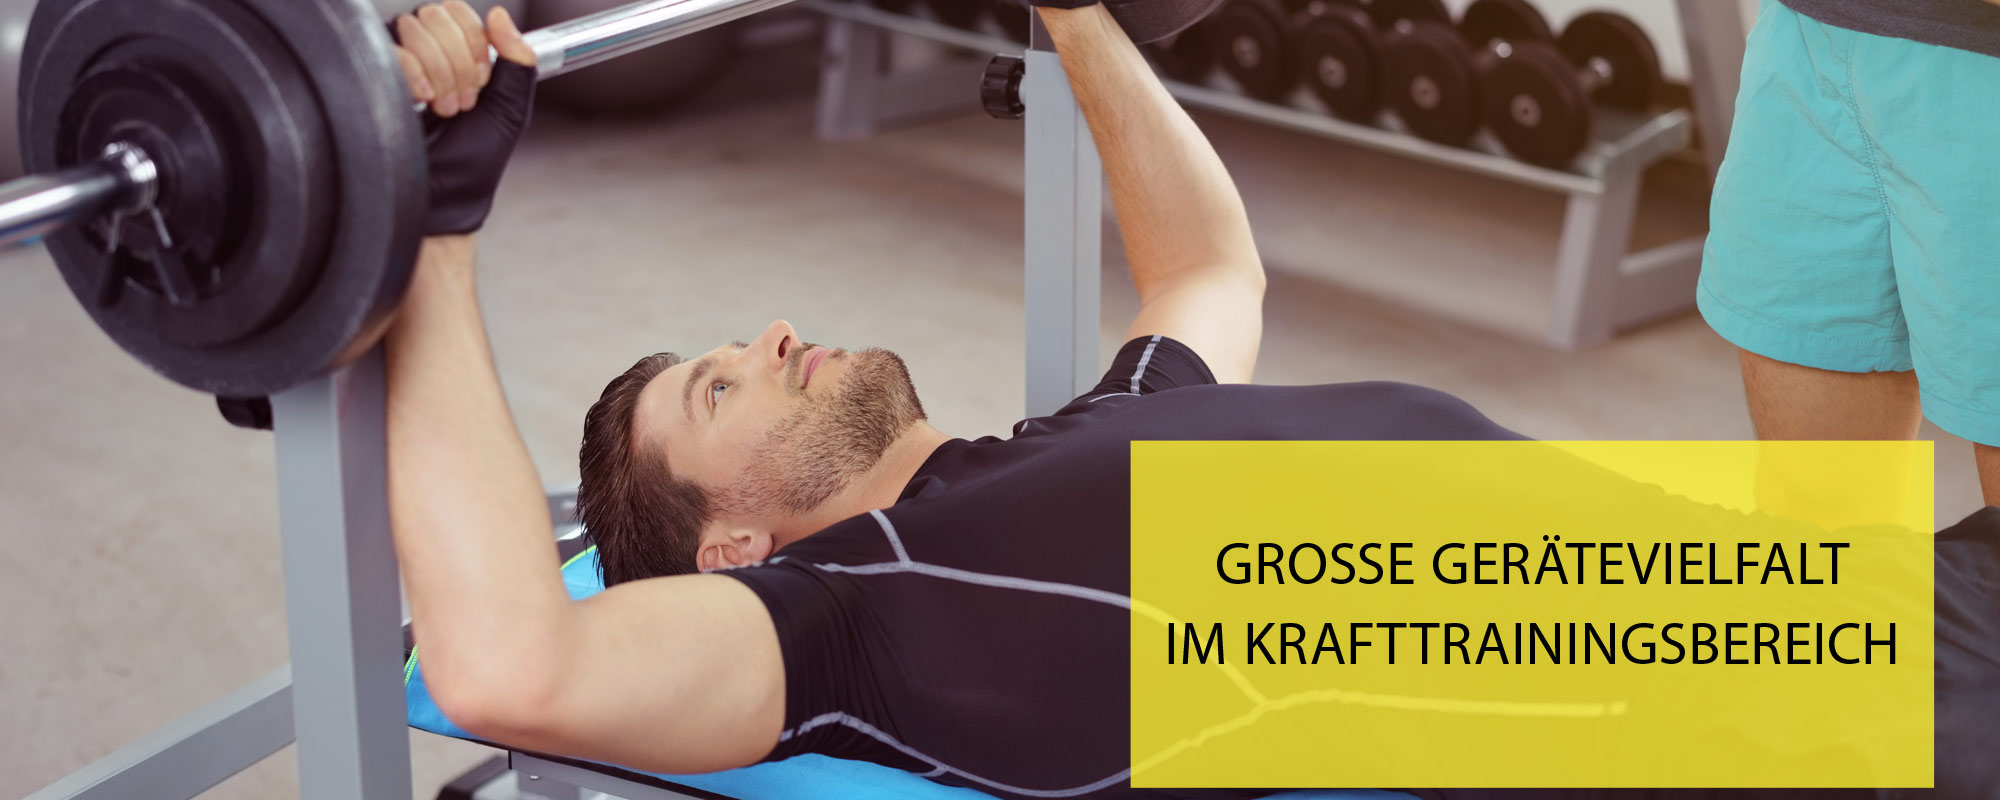 Gerätevielfalt - Pro Fitness Discounter